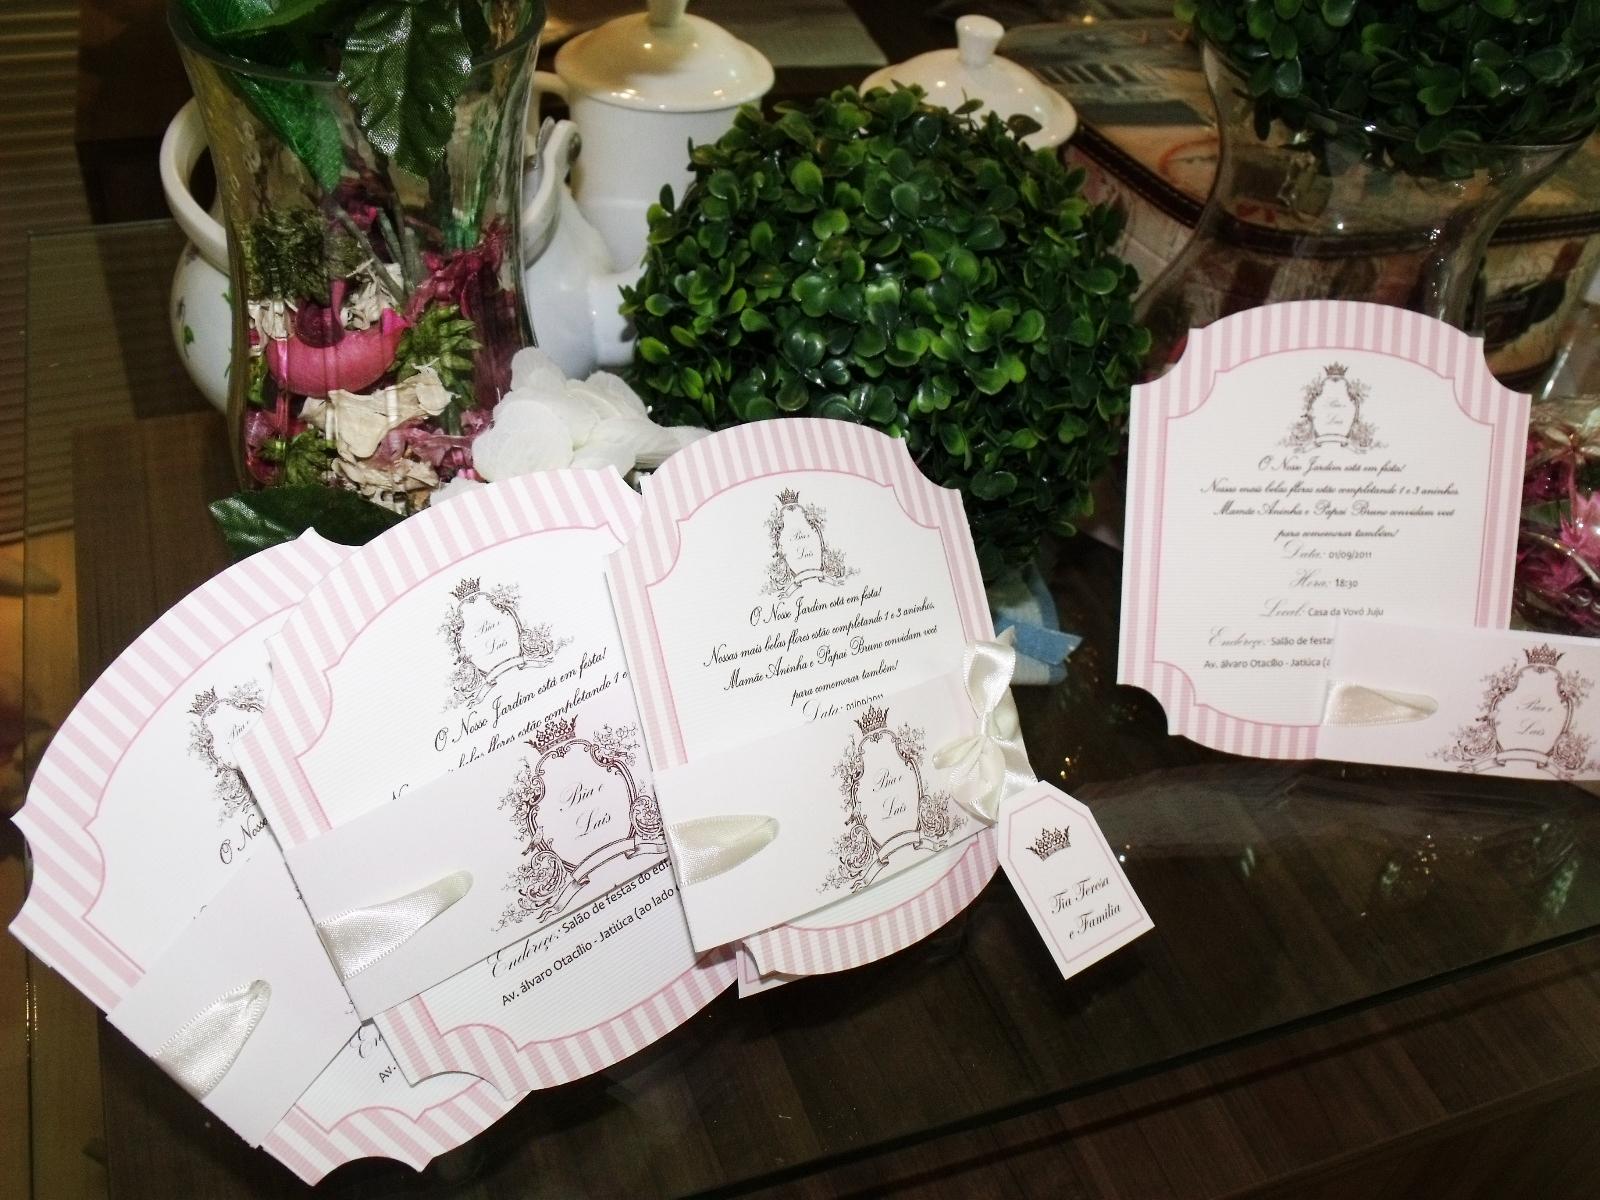 festa jardim da princesa : festa jardim da princesa:Joy Joy Atelier: Festa Jardim Provençal – Princesas